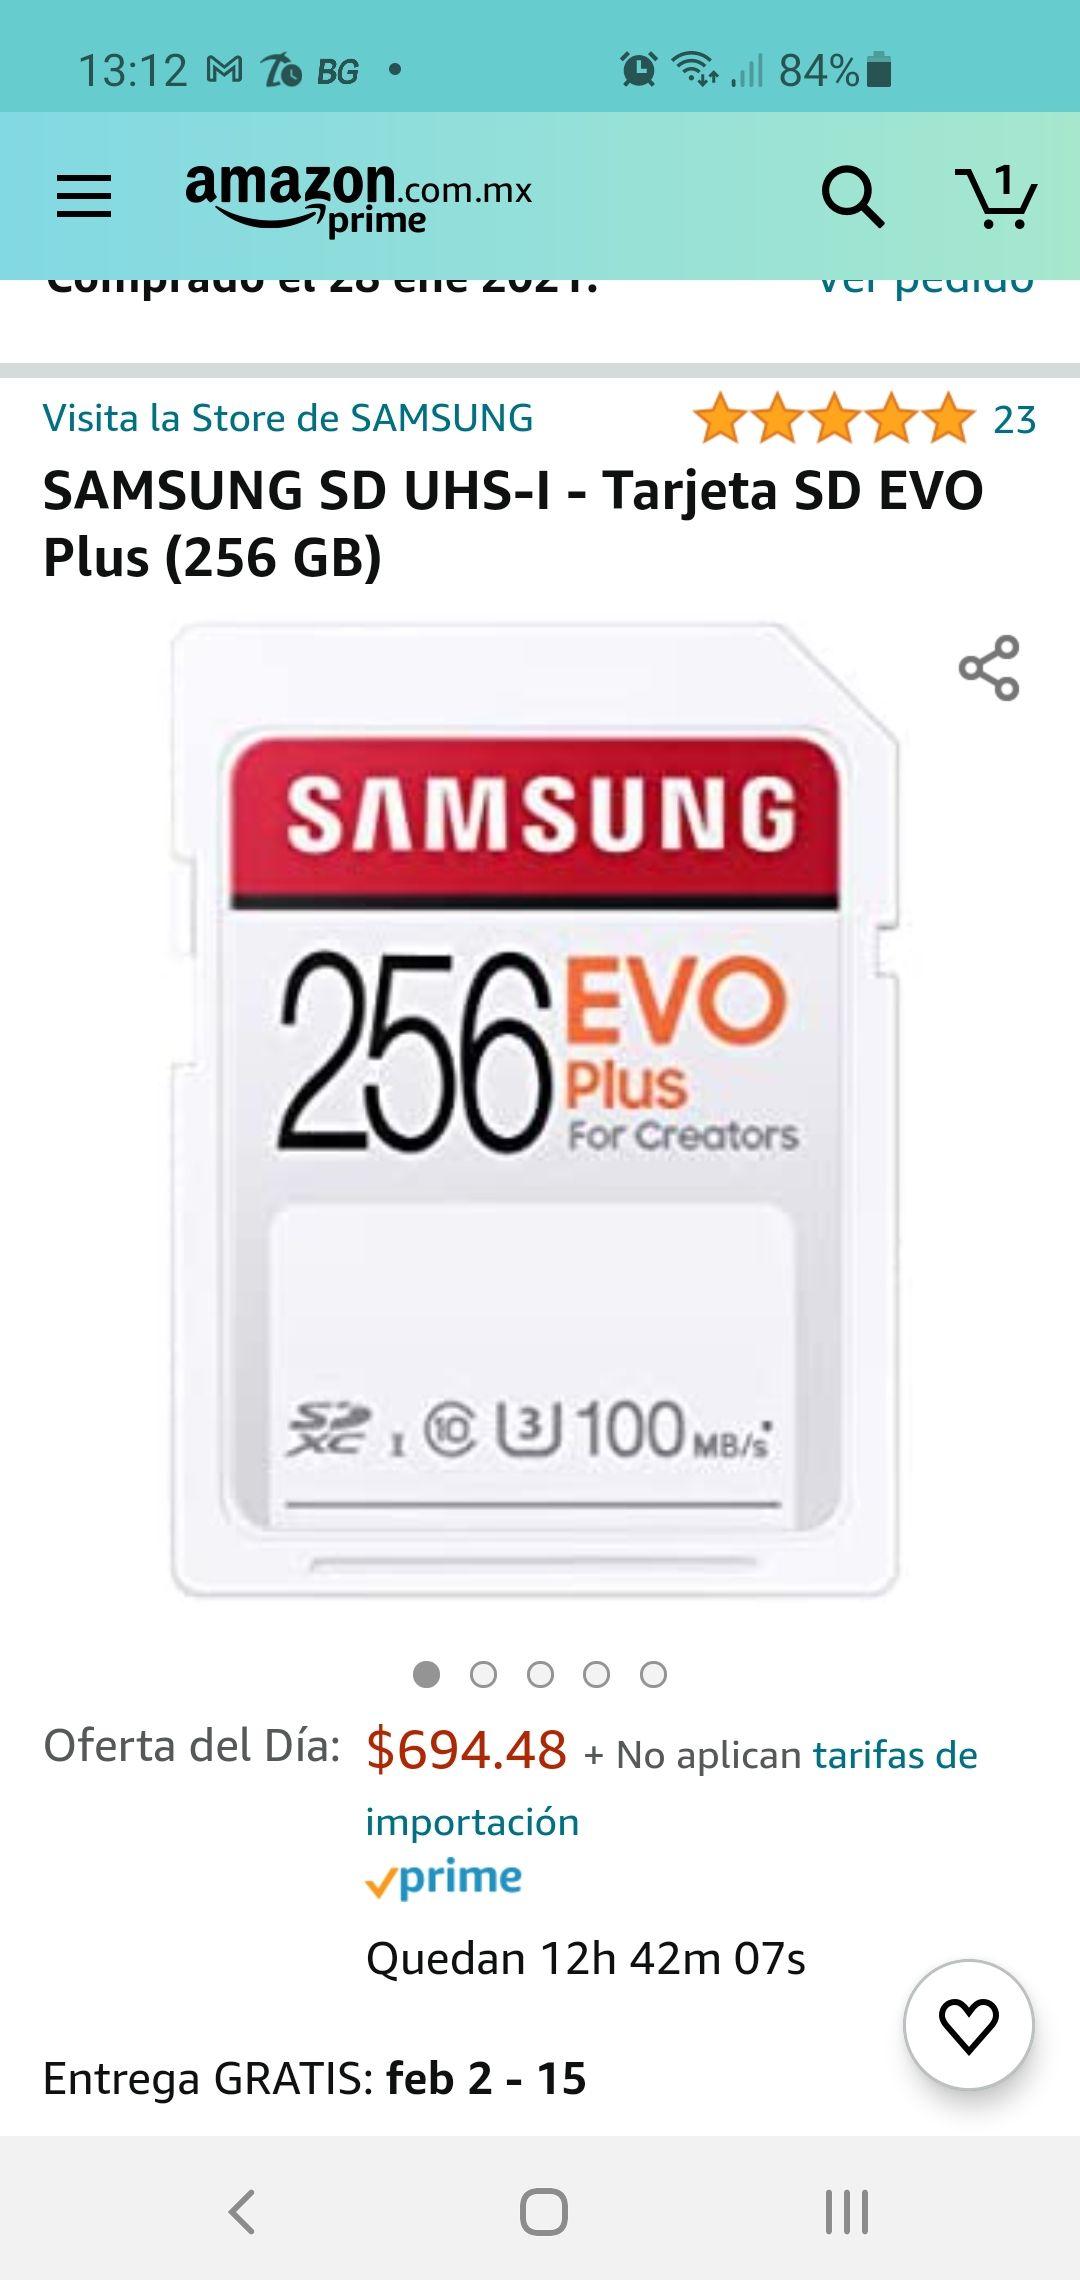 Amazon: SAMSUNG SD UHS-I - Tarjeta SD EVO 256GB